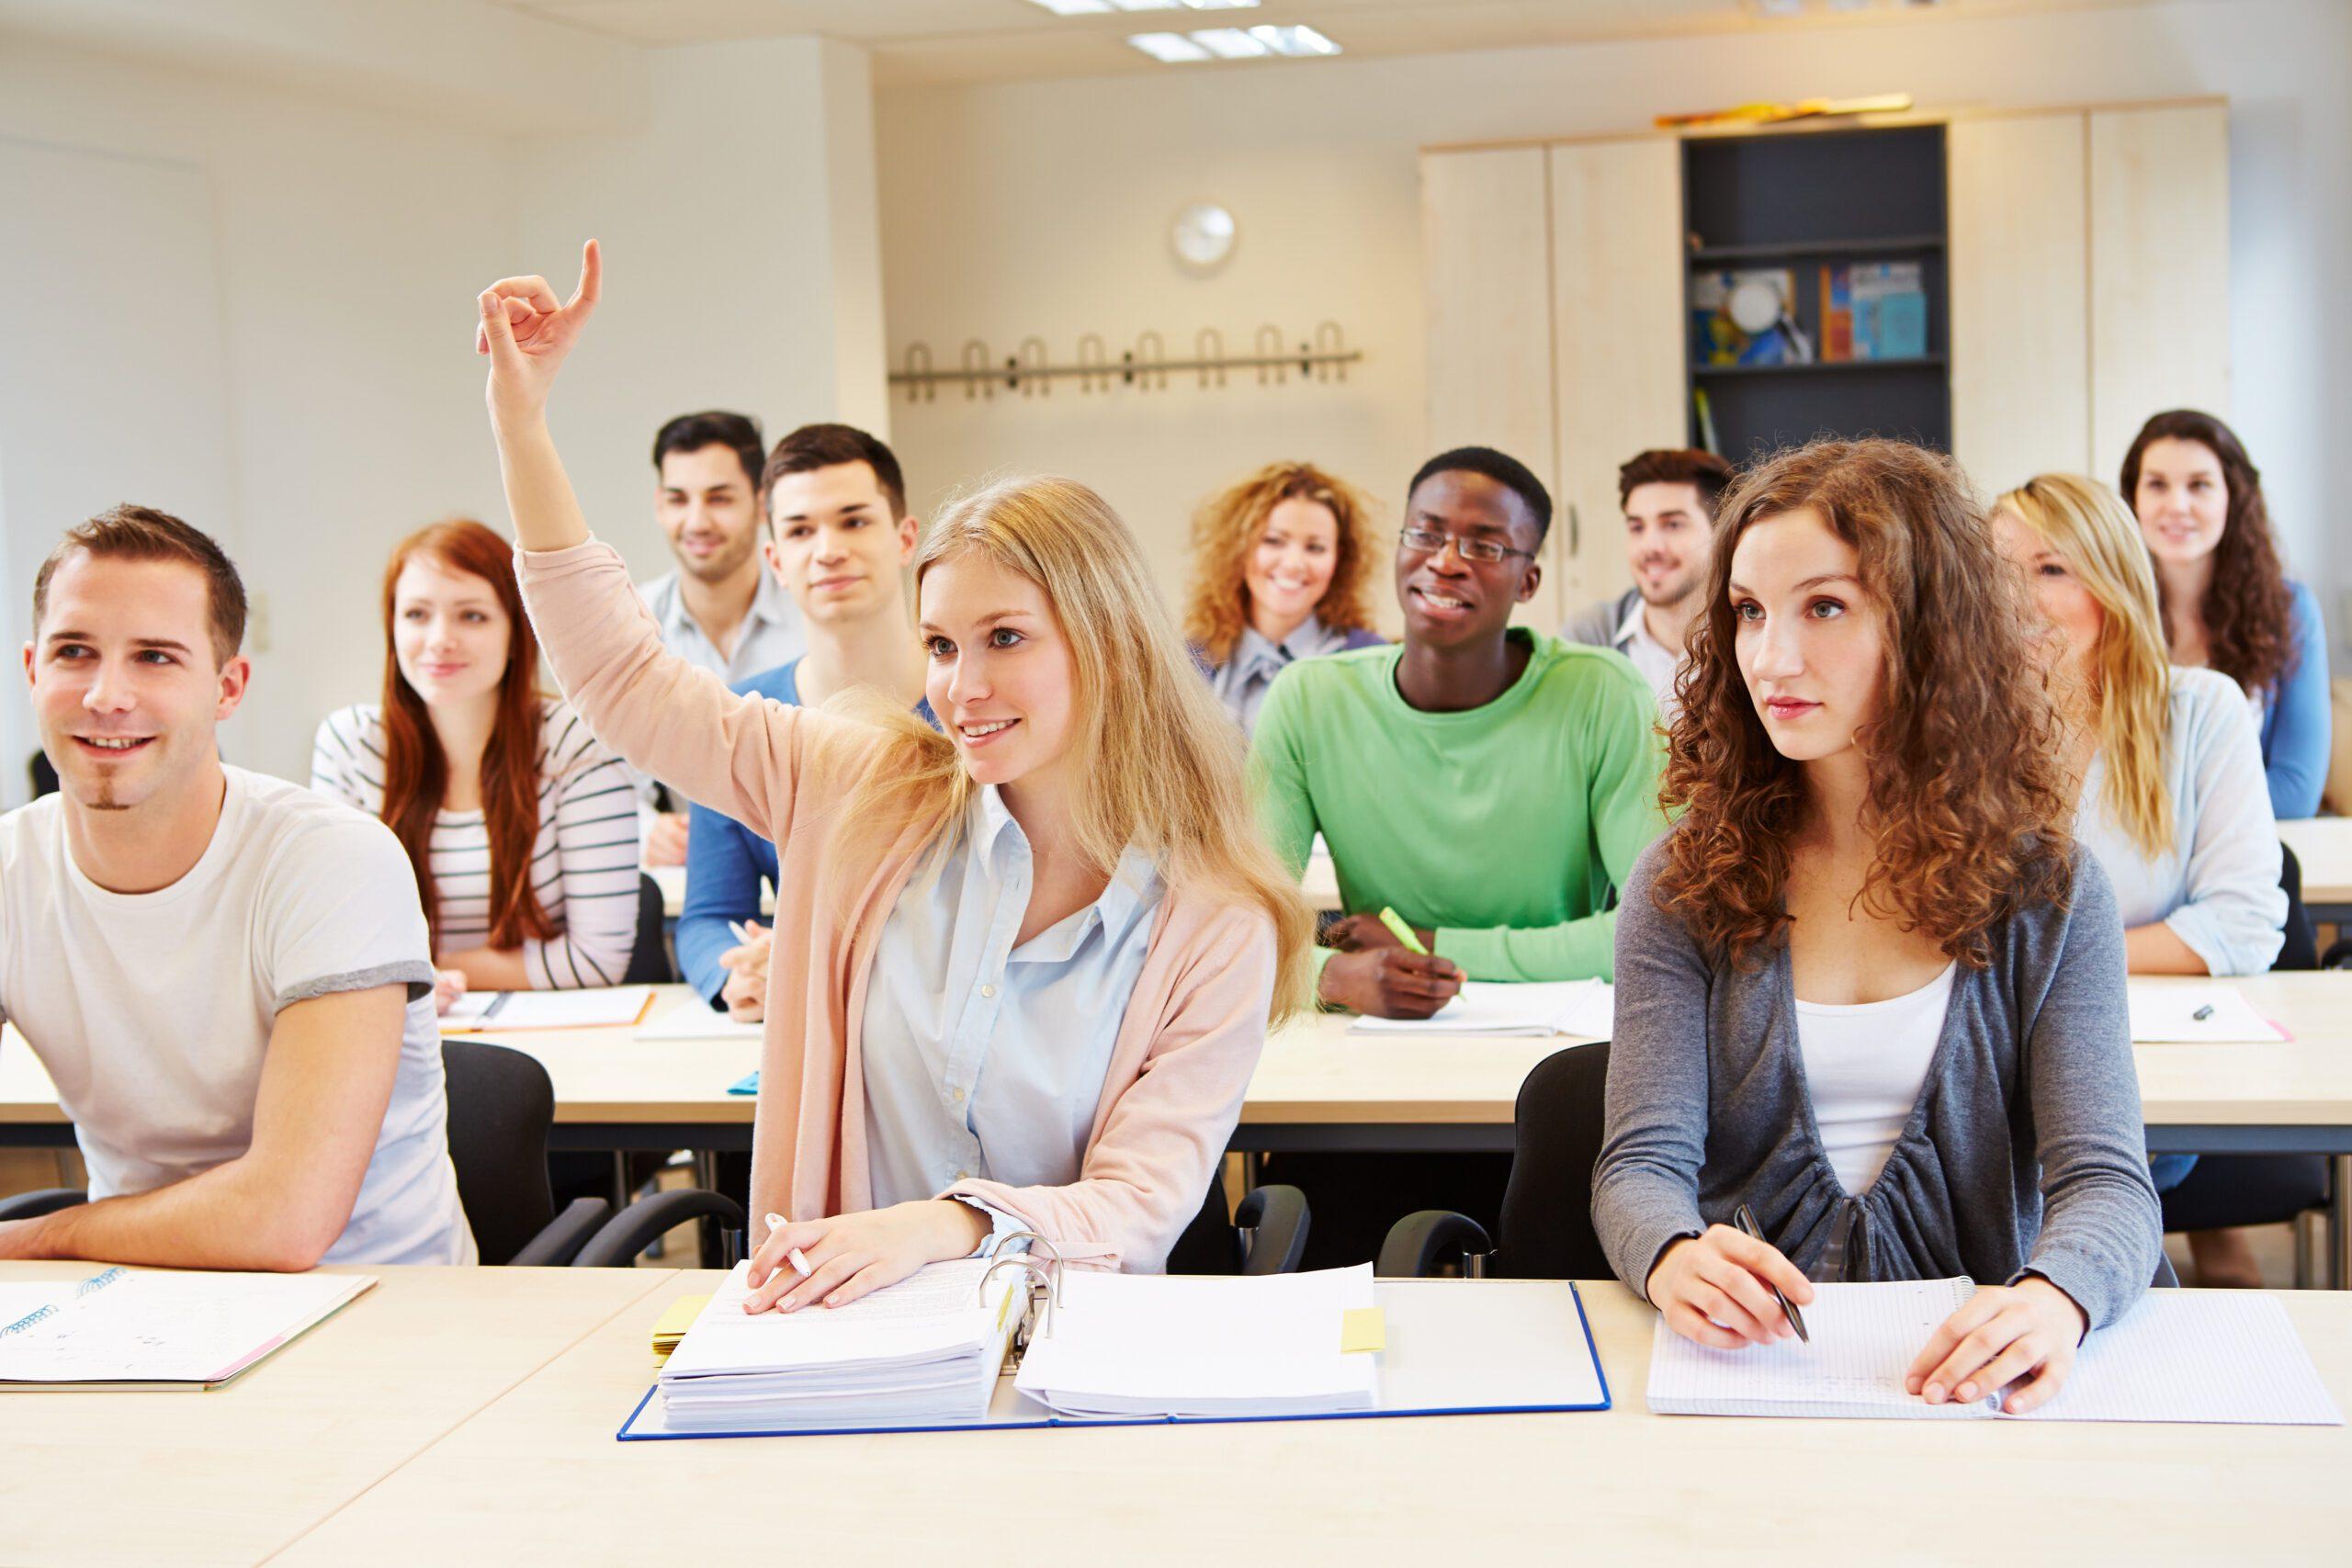 MadeToGrow - Adults studying